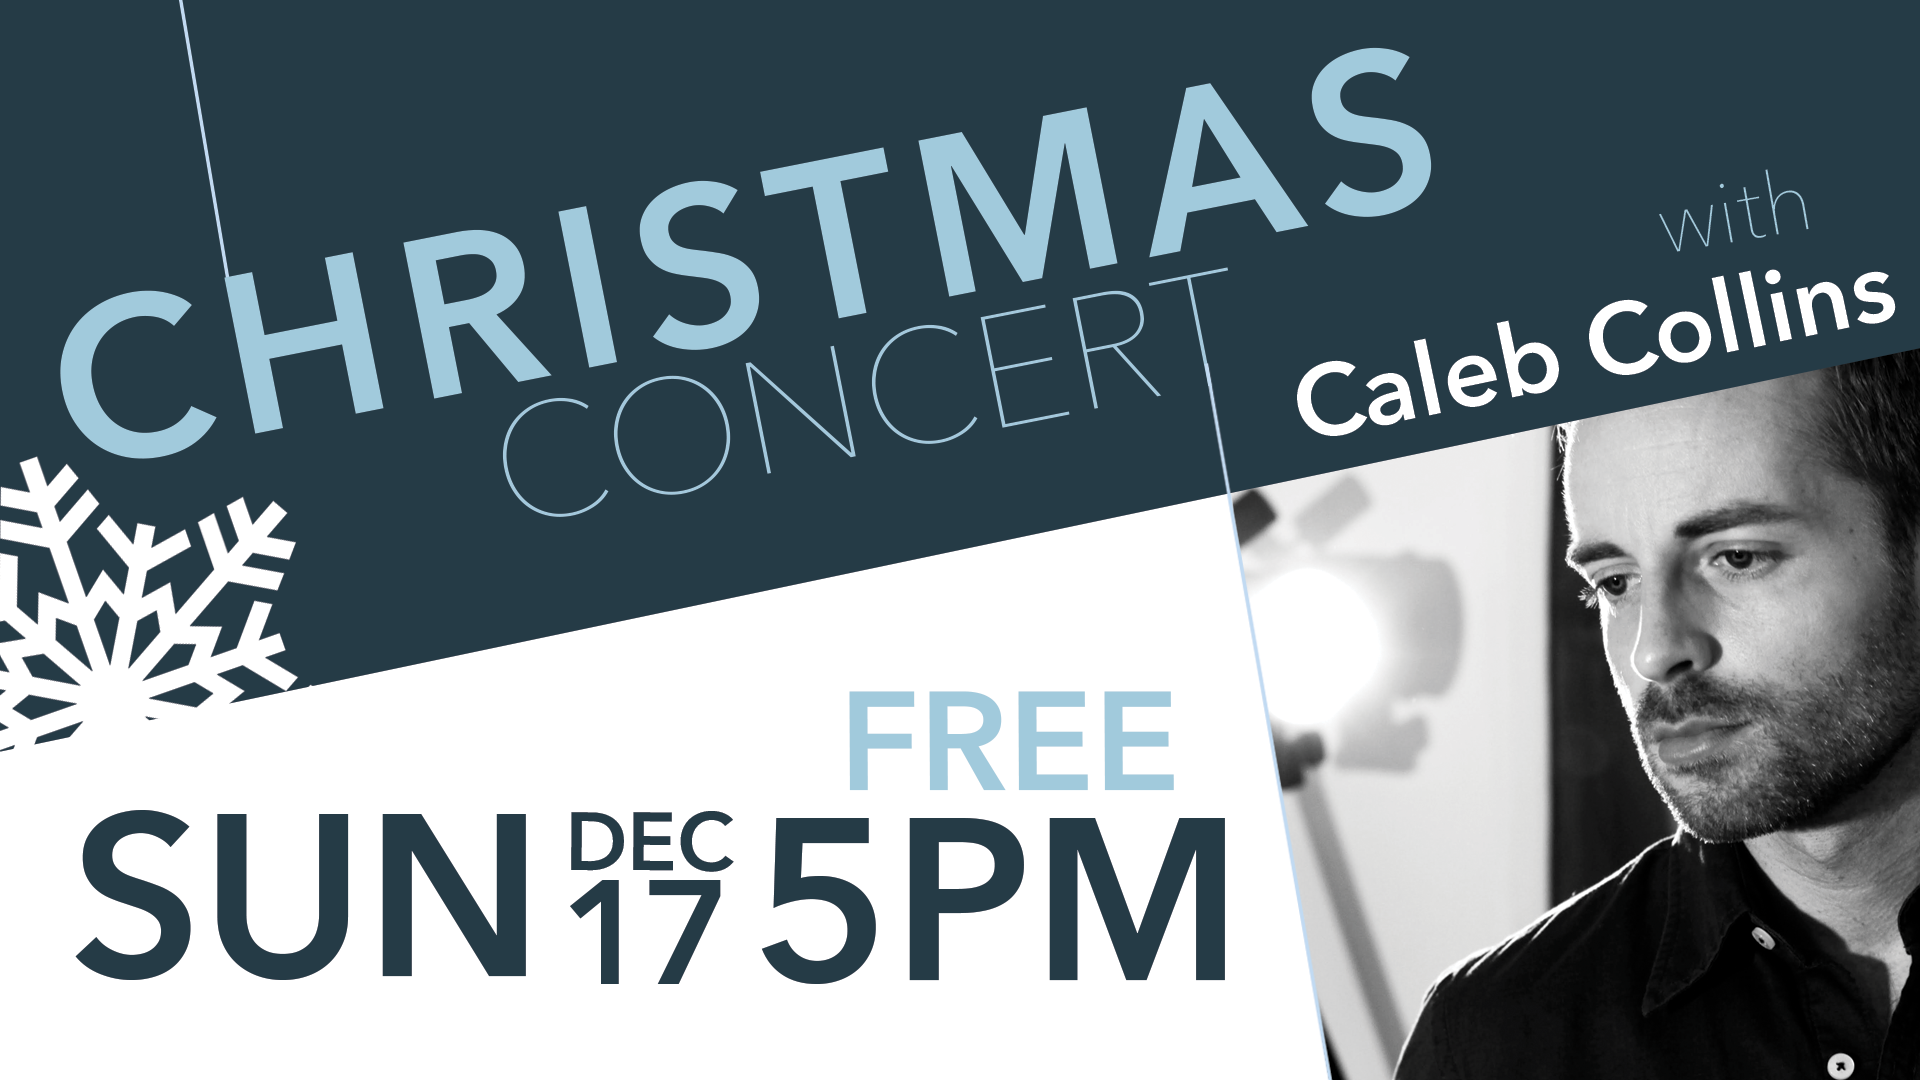 Caleb collins concert